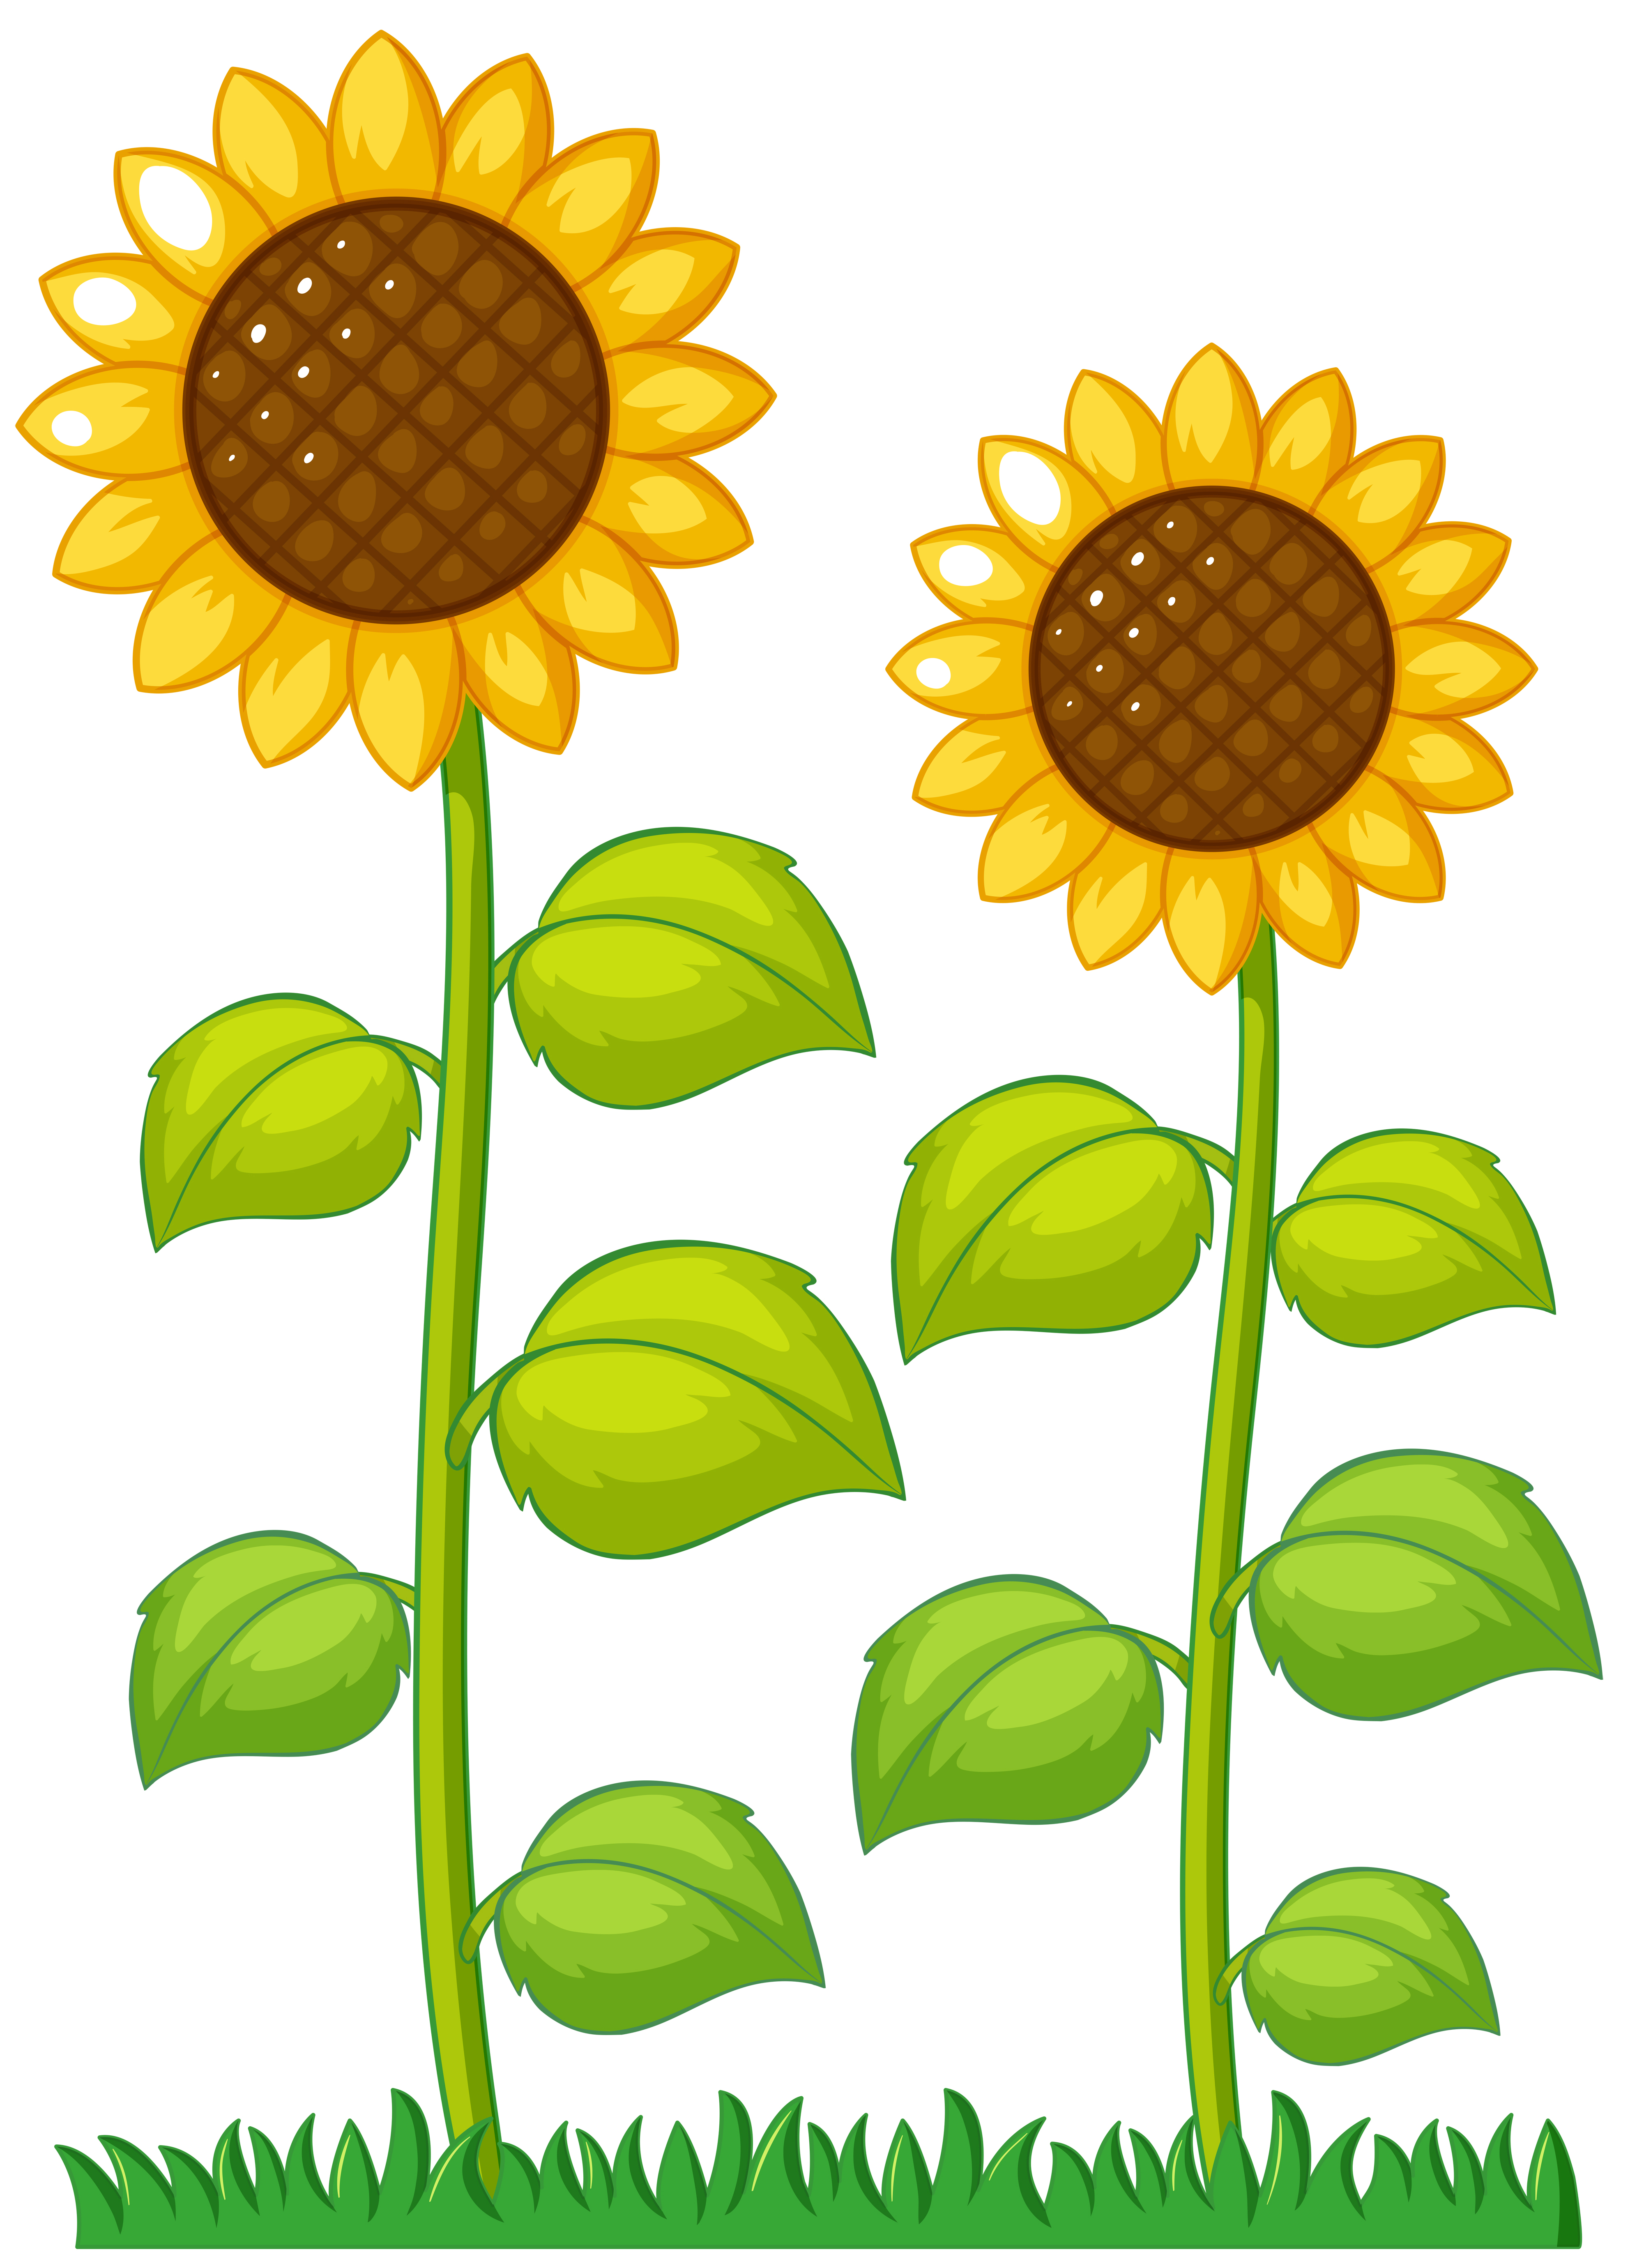 Two Sunflowers In The Garden Download Free Vectors Clipart Graphics Vector Art